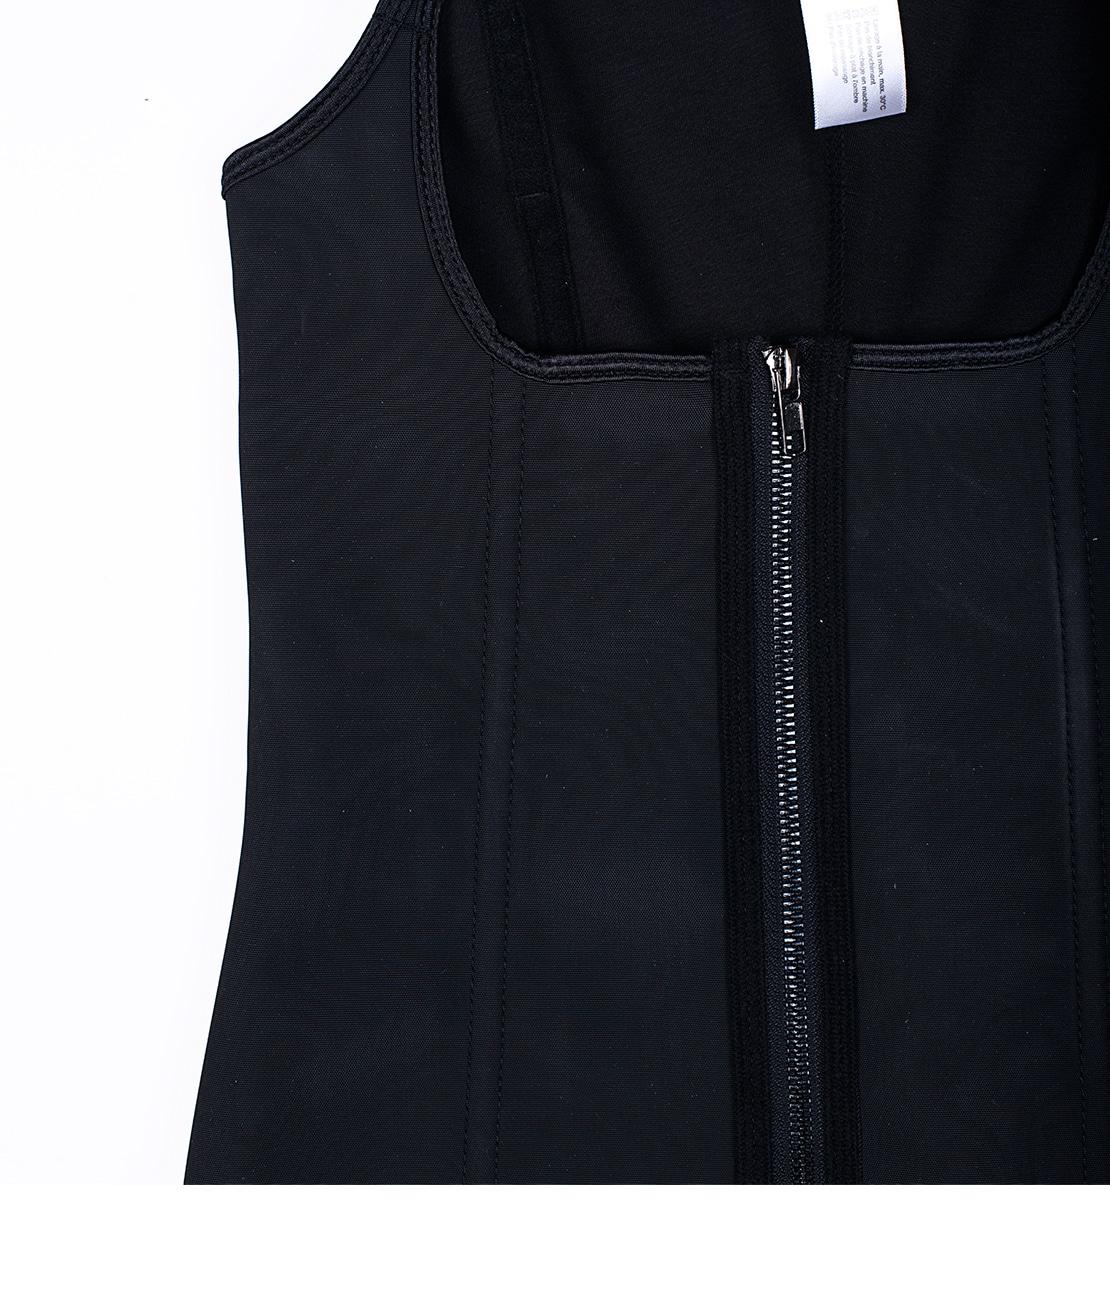 Corset Latex Remodelant Noir Packshot Detail 2